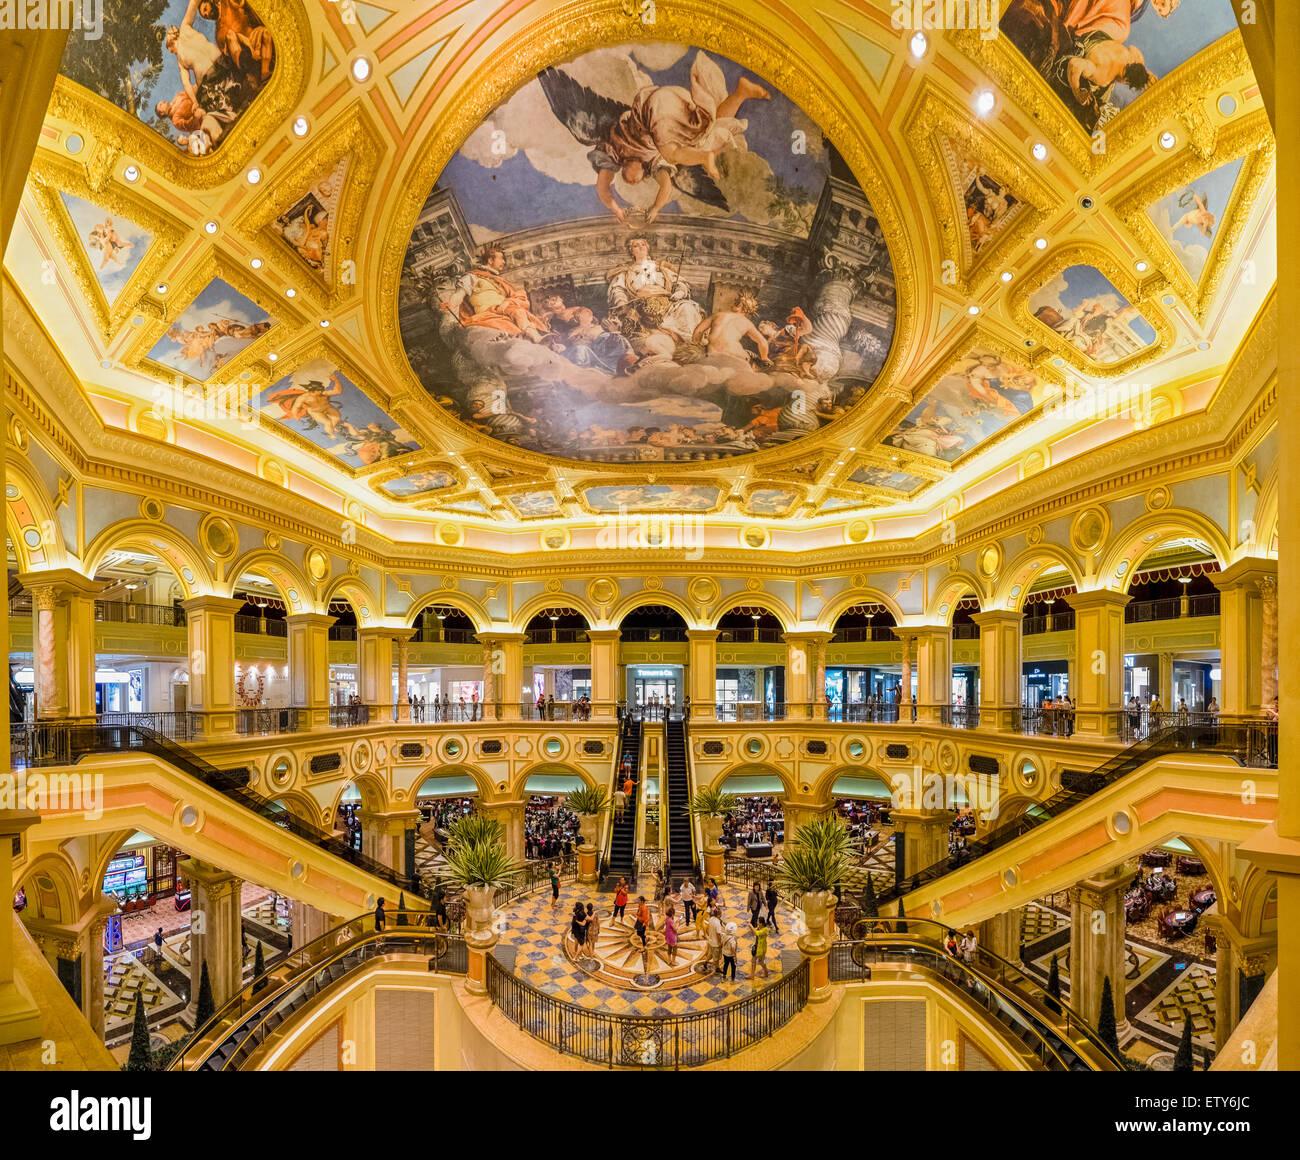 venetian hotel and casino macao